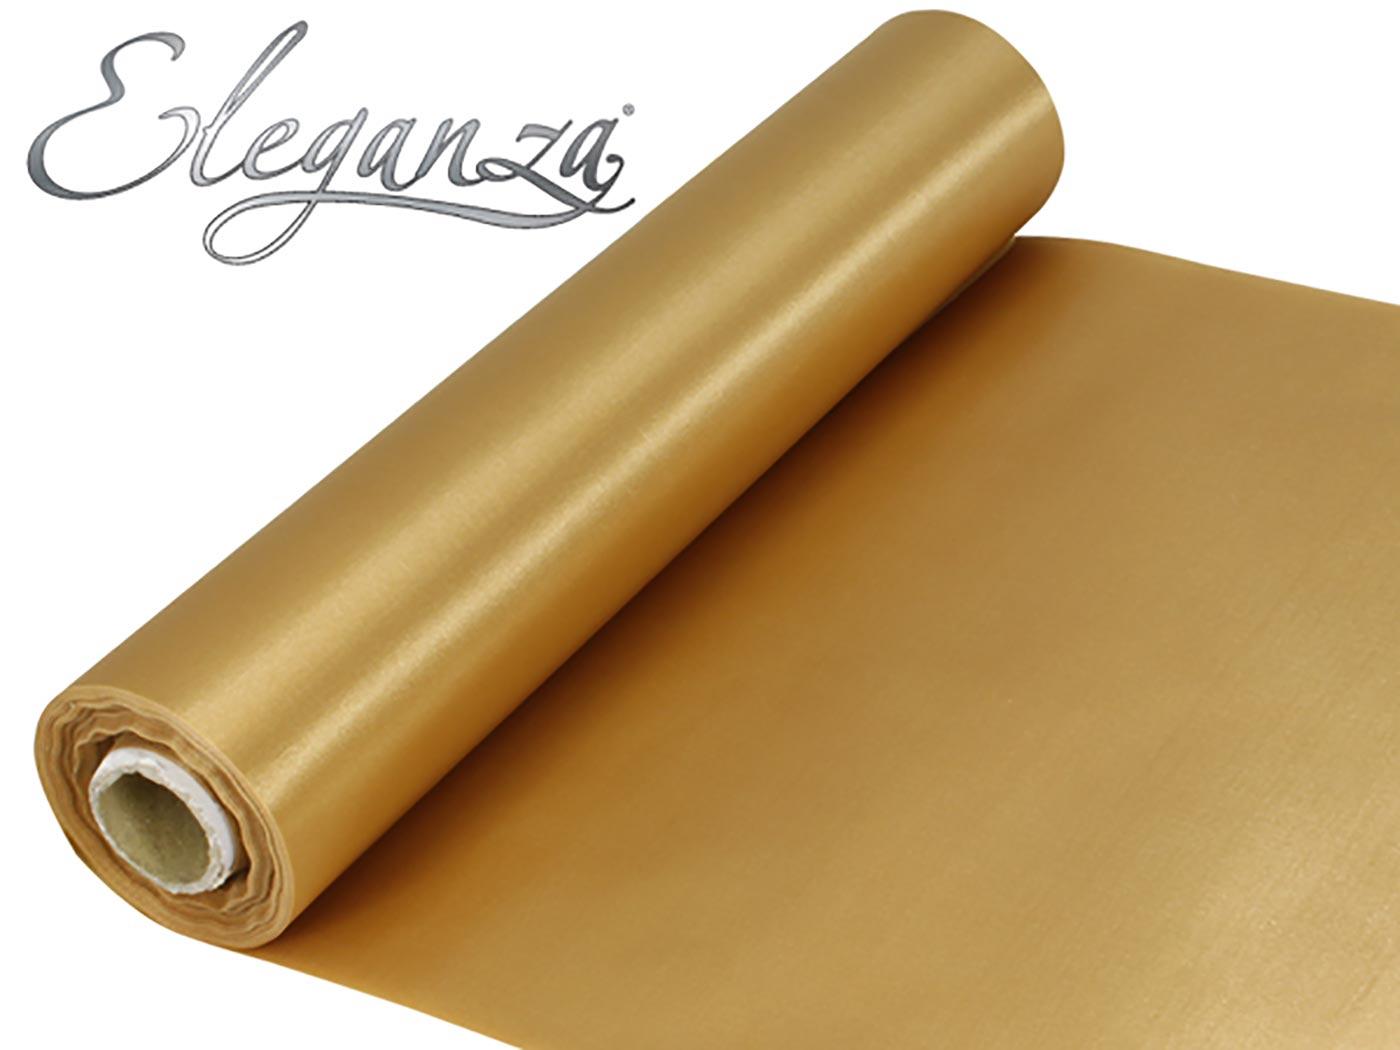 Eleganza Satin Fabric 29cm x 20m Gold